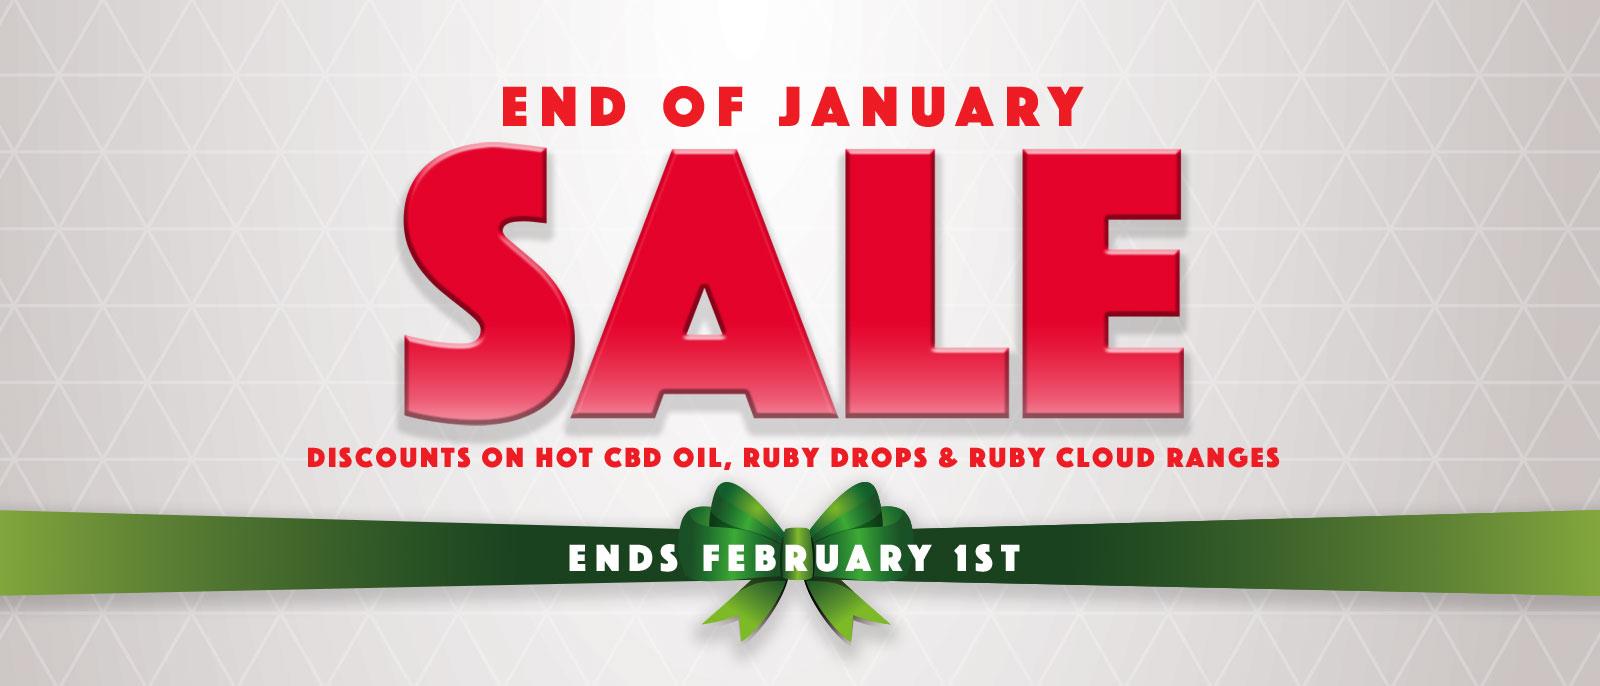 end of january sale cbd vape oil and drops glasgow